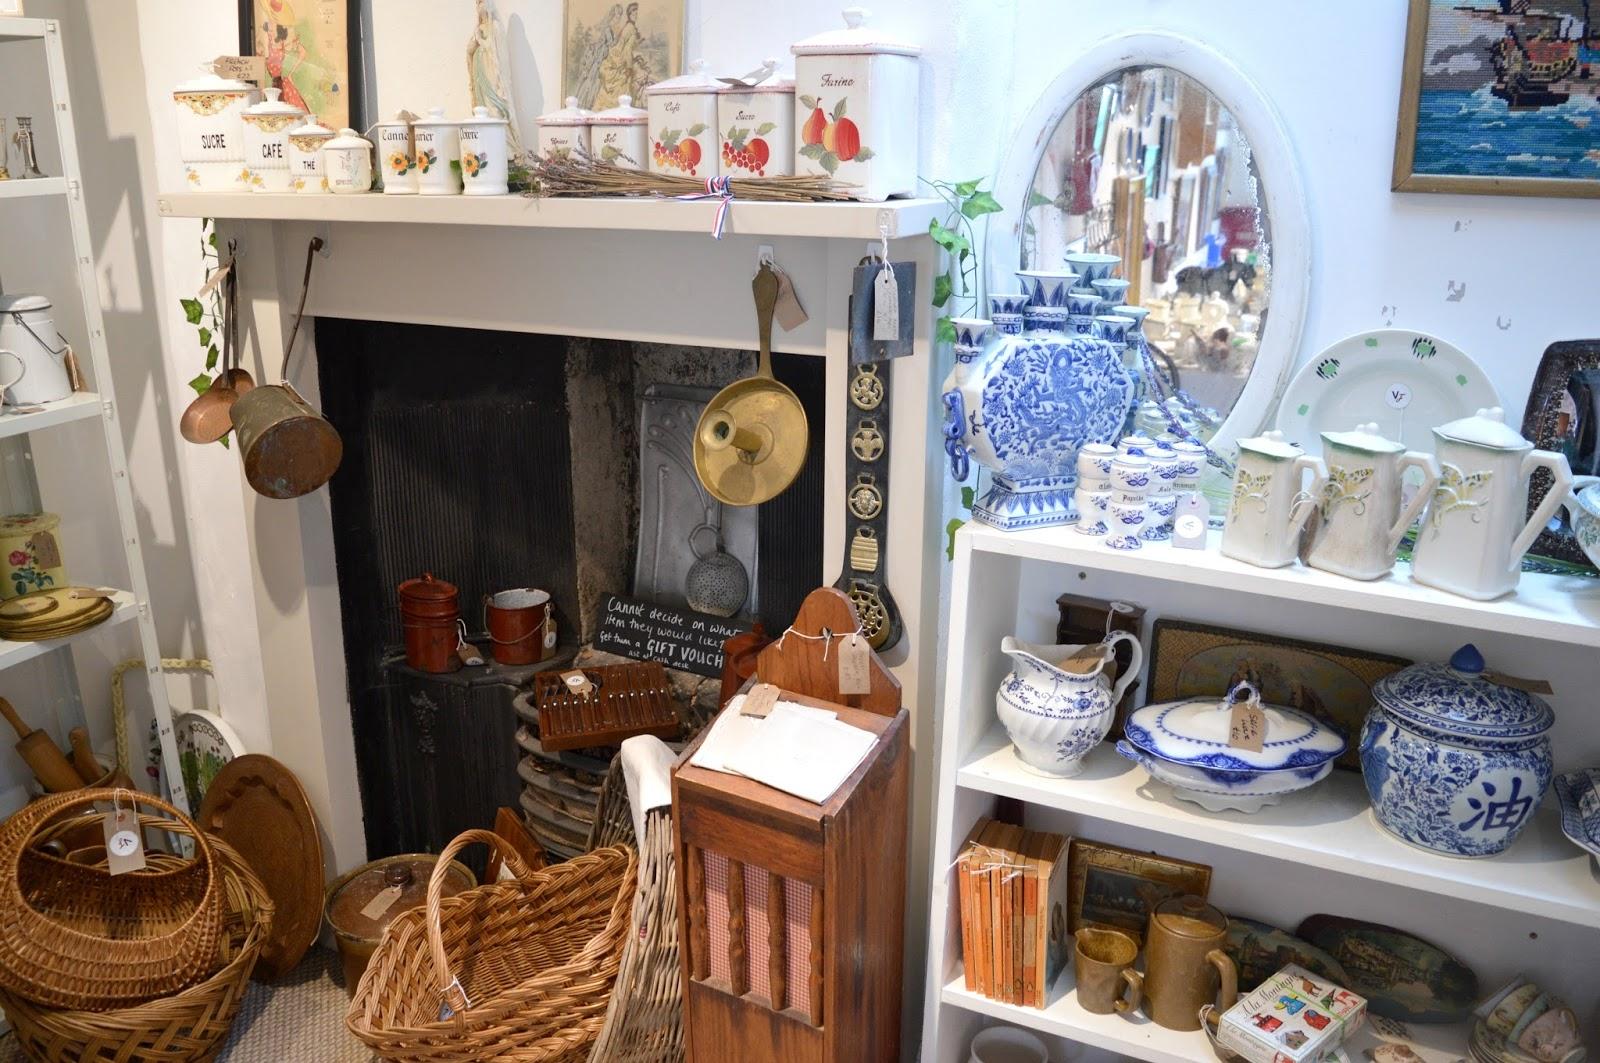 Hexham Northumberland - The Vintage Emporium